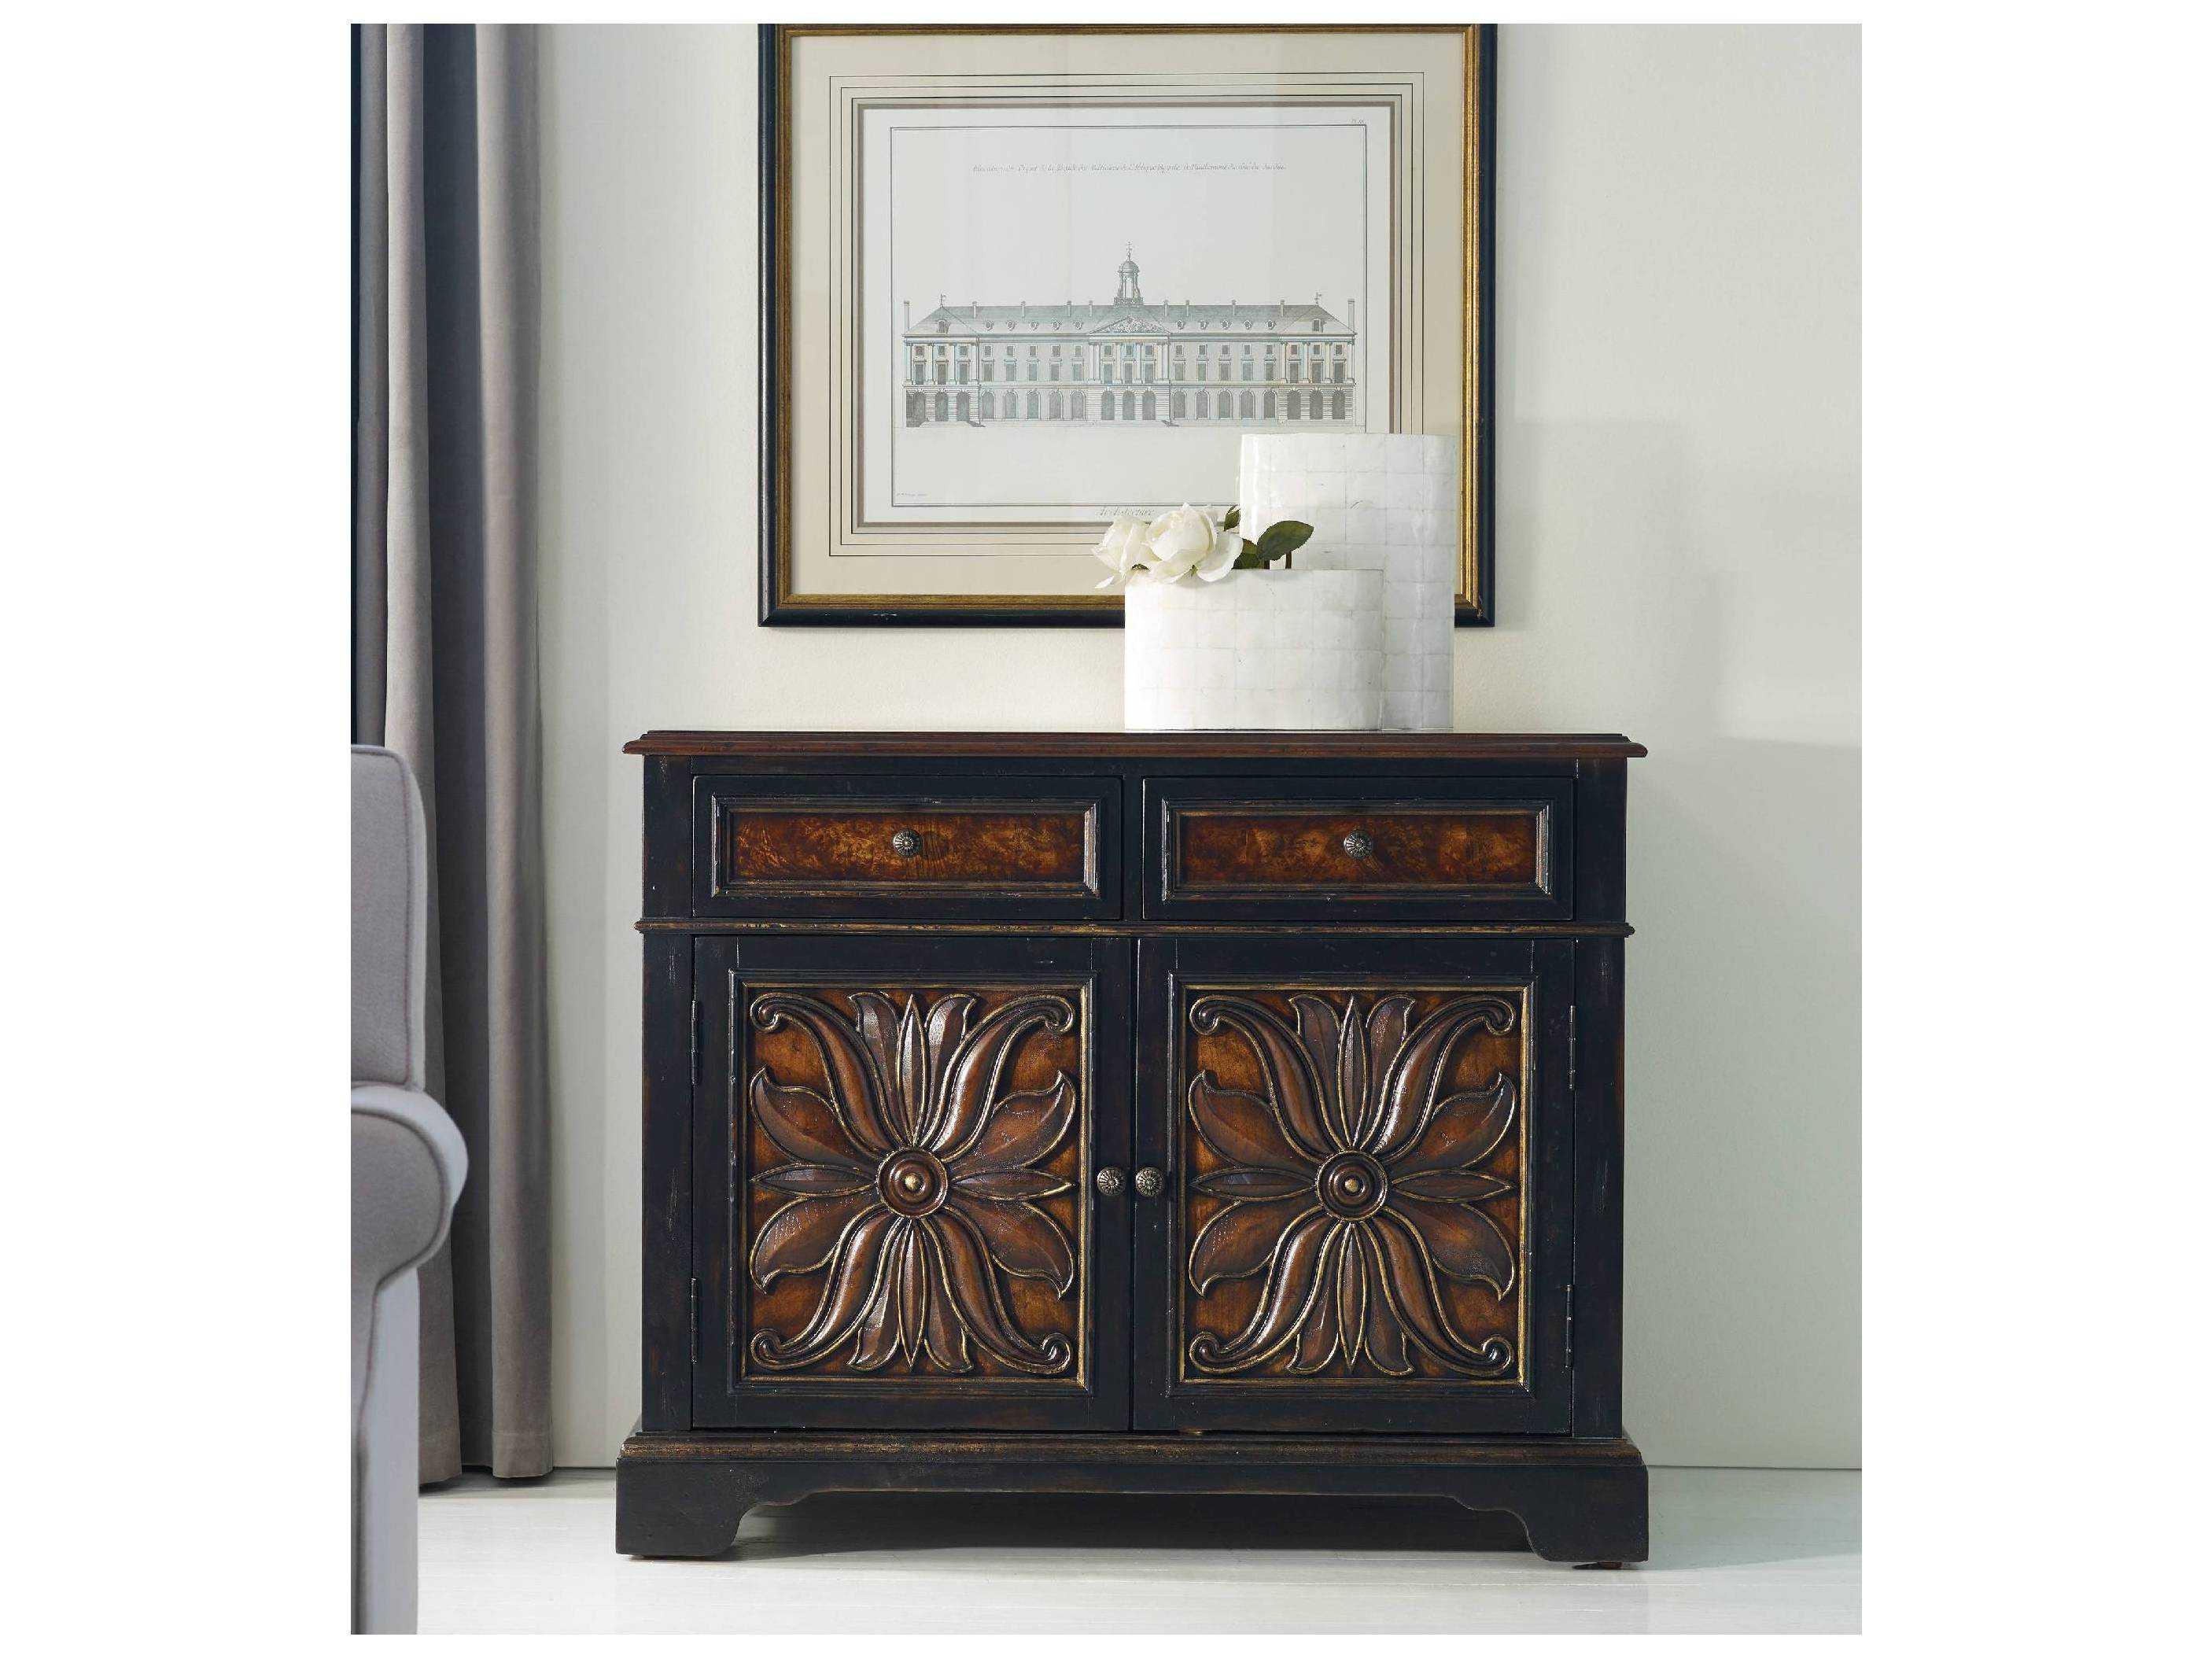 Hooker Furniture Grandover Black With Gold Accent 43 L X 21 W Rectangular Buffet Hoo502985002